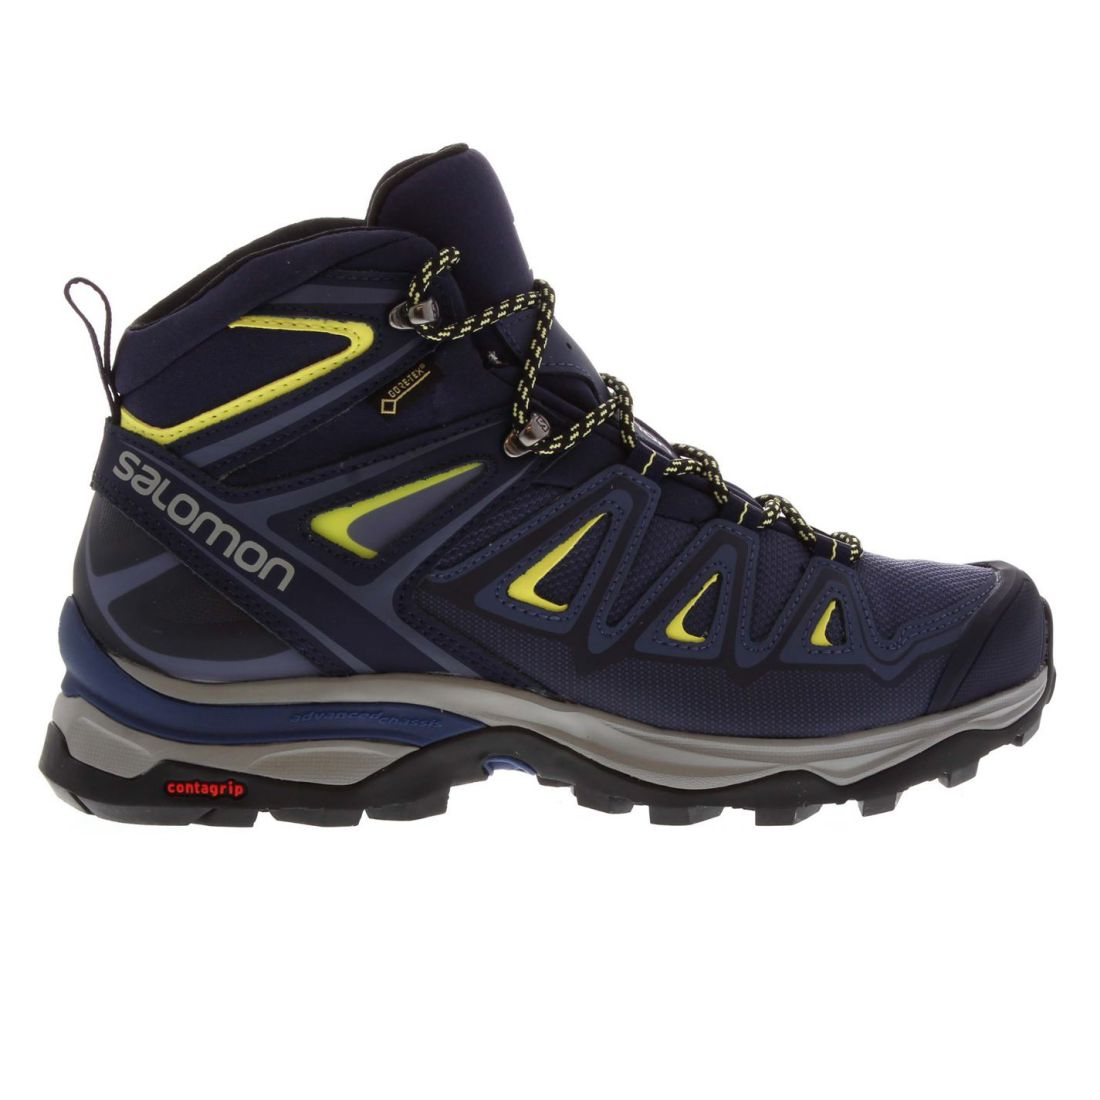 Salomon XUltra 3 M GTX Walking zapatos Ladies botas Laces Fastened Padded Ankle